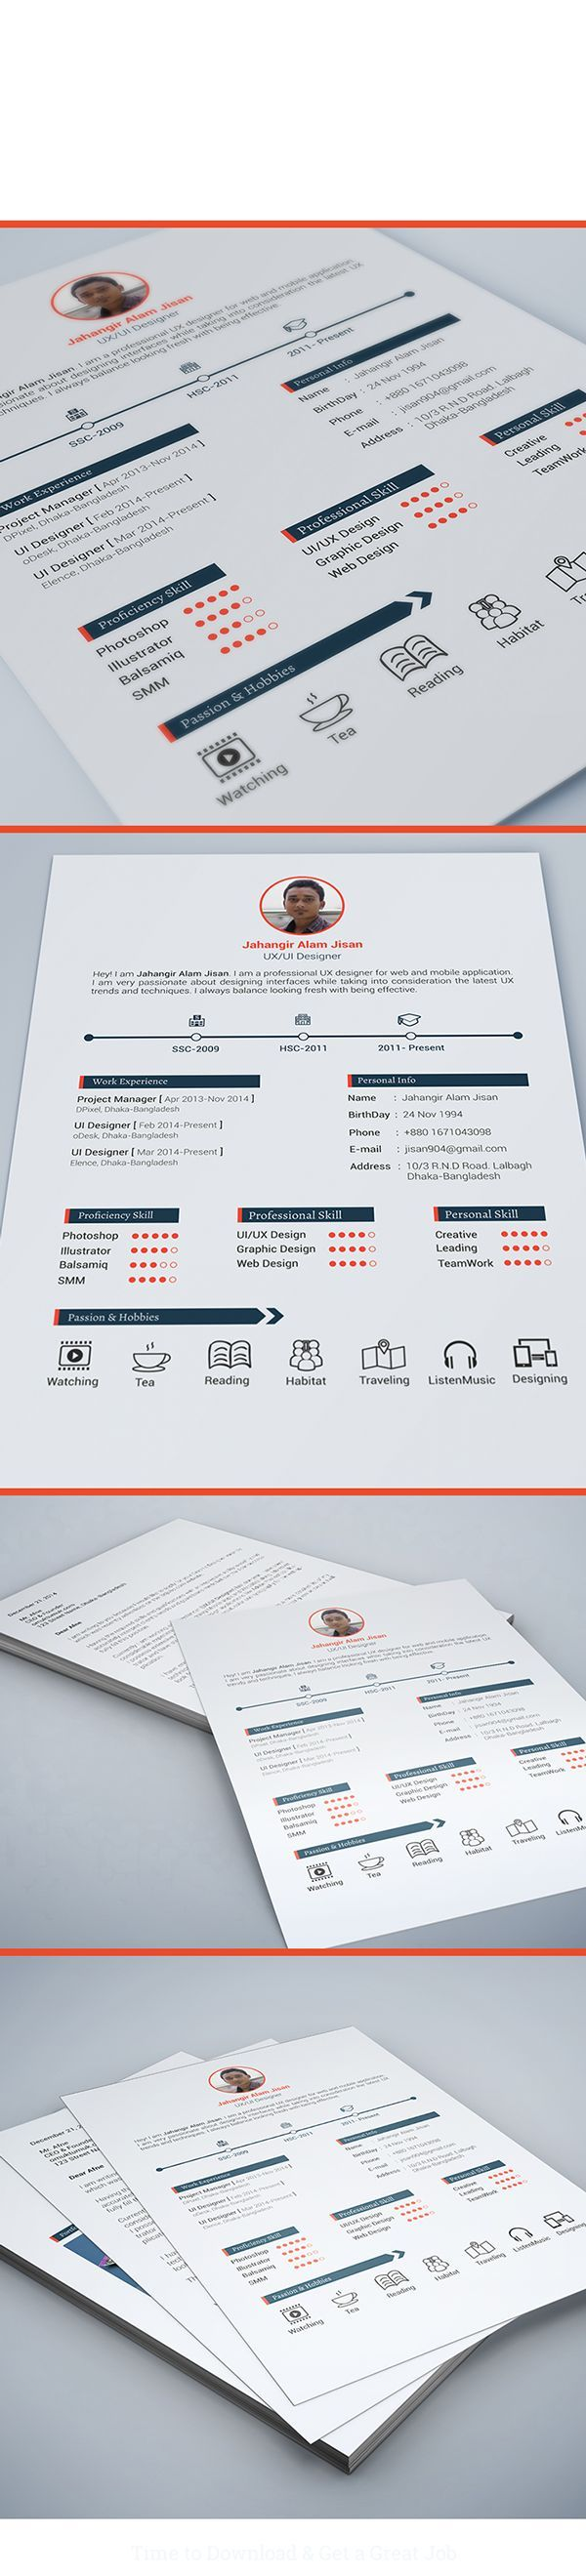 9 best CV images on Pinterest | Resume design, Resume templates and ...